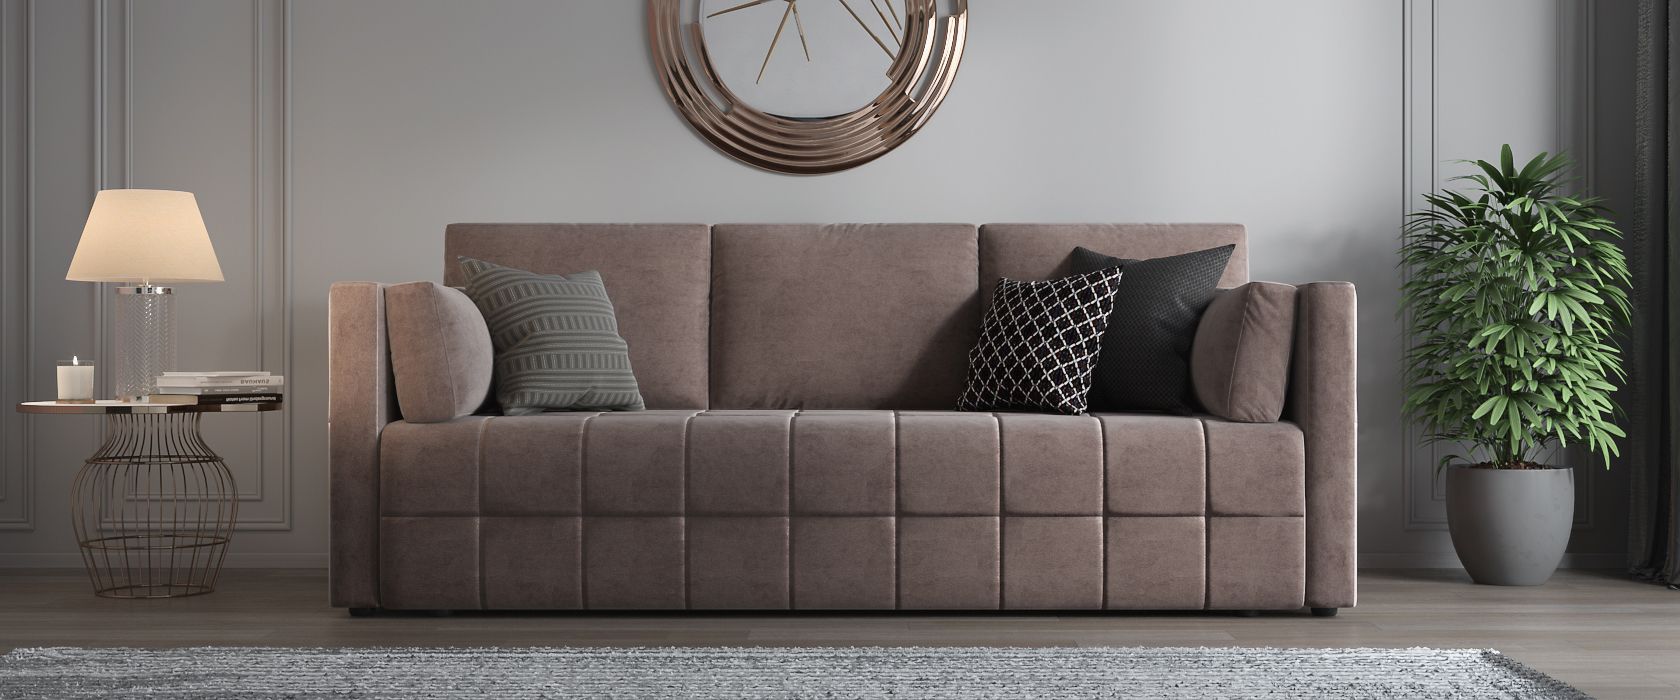 Трехместный диван Sofia - Фото 2 - Pufetto